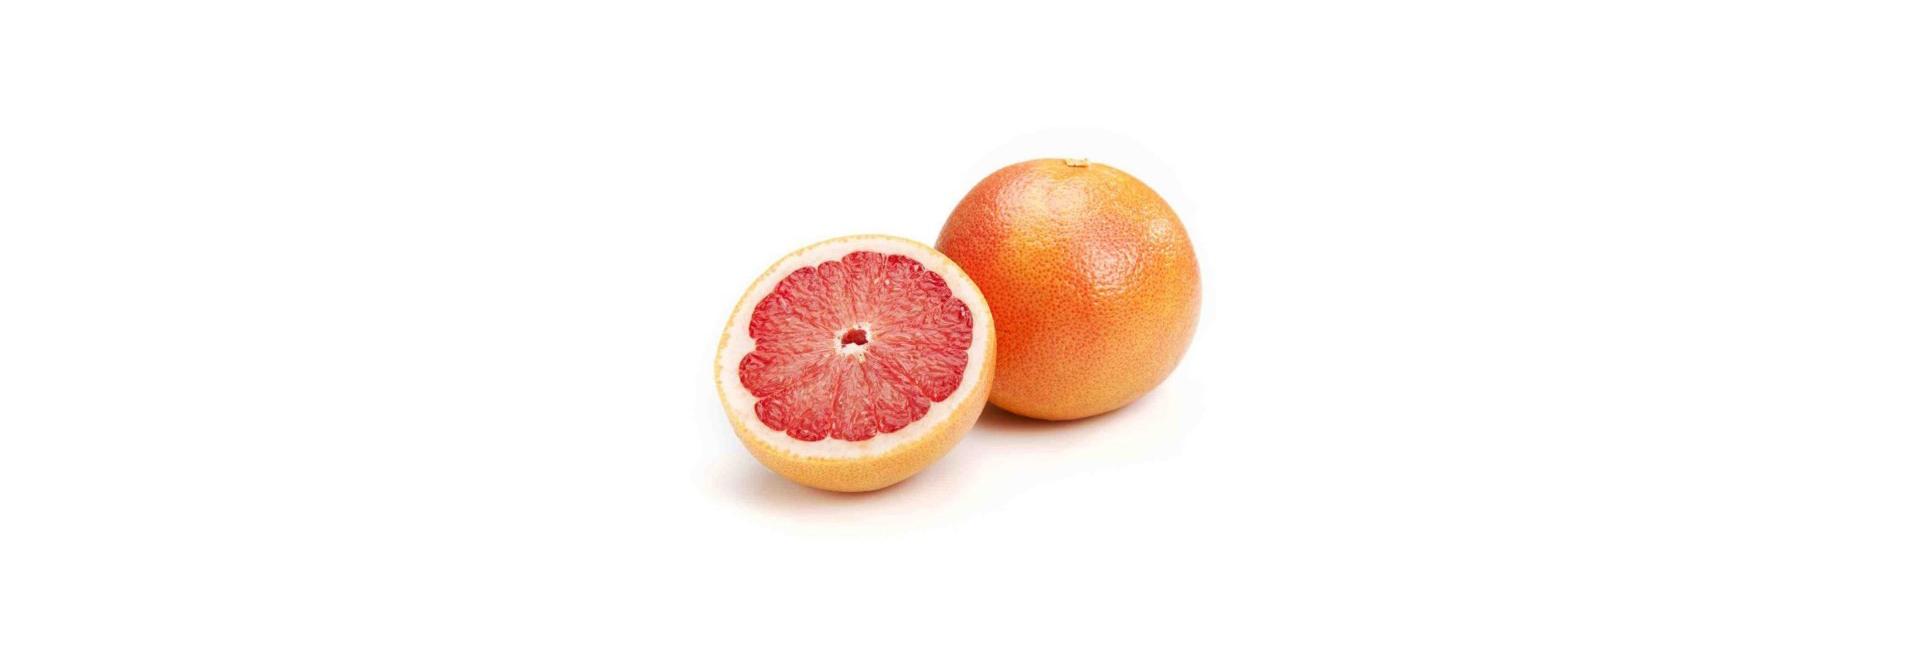 Лимон и розовое дерево